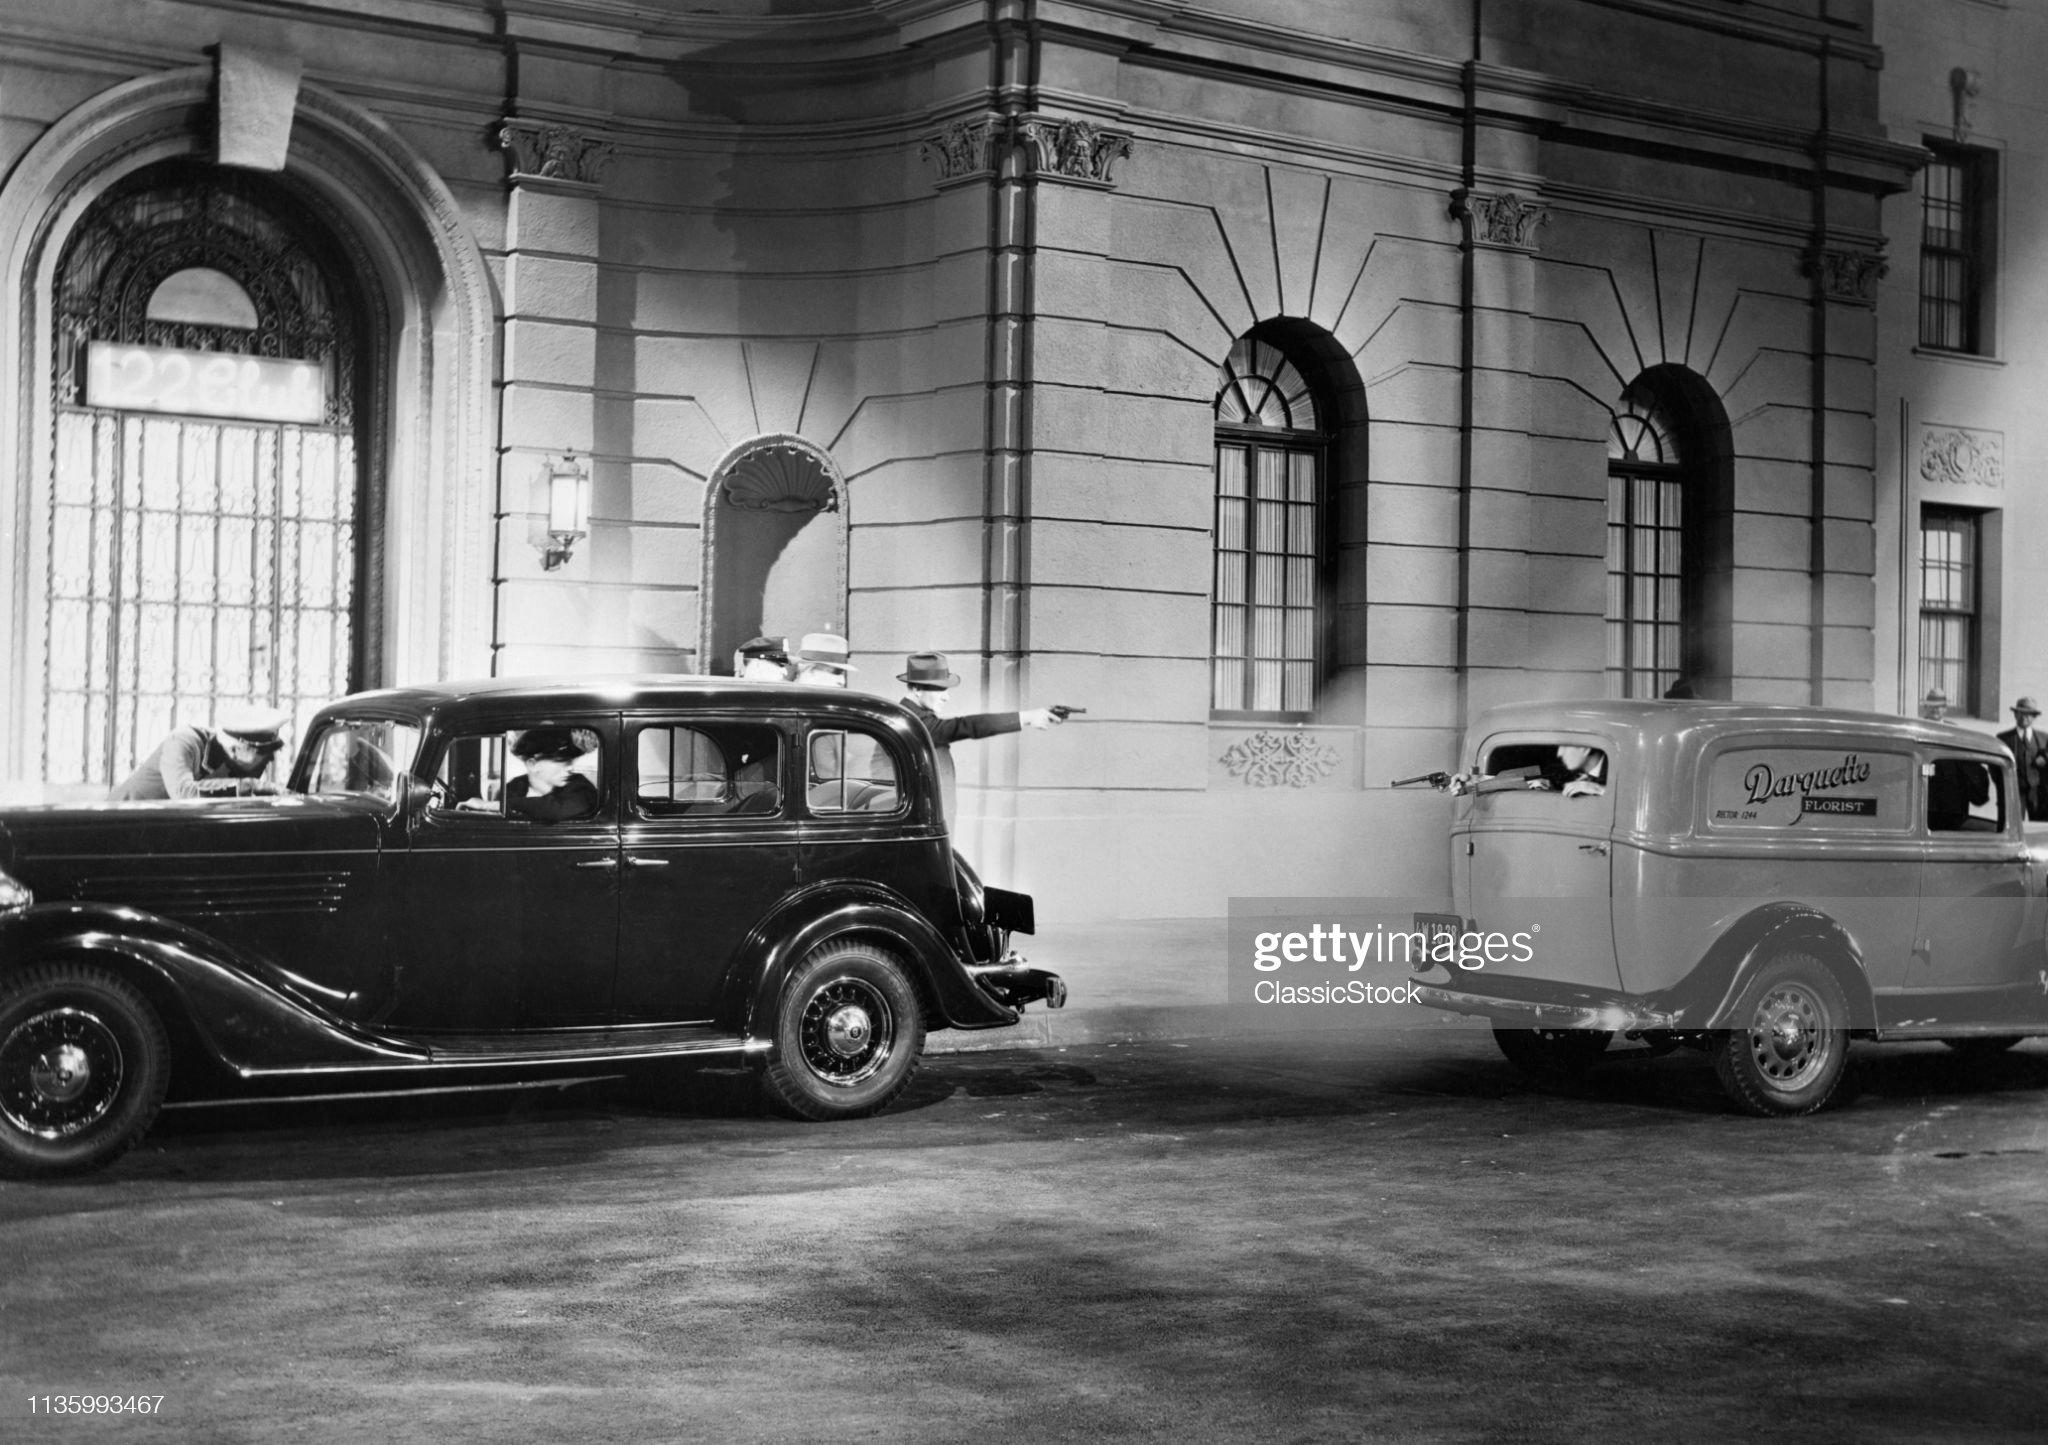 1930s MOVIE STILL OF... : News Photo